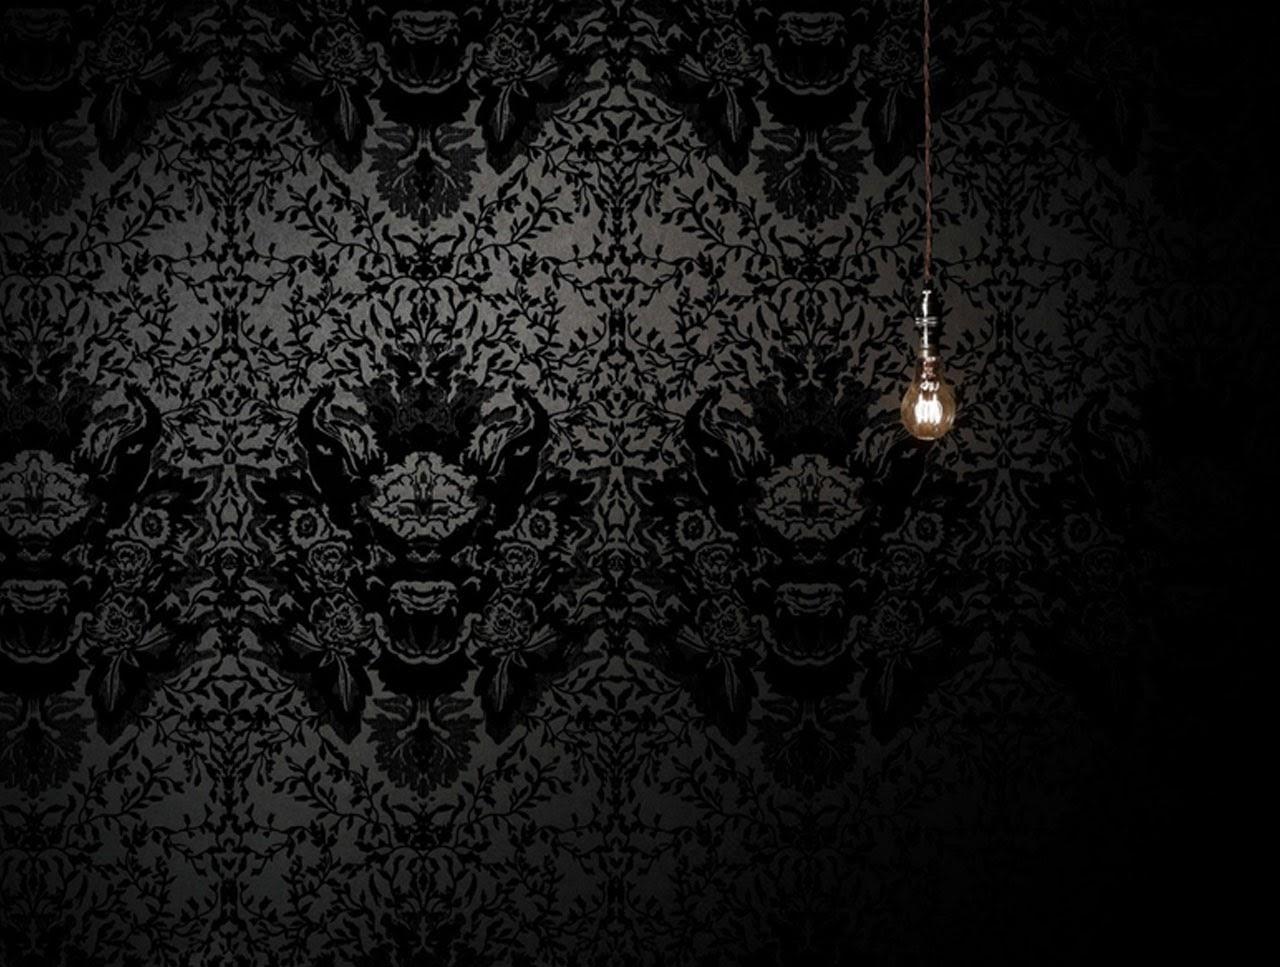 Black Damask Wallpaper ~ WallpaperYork | Brows your ...